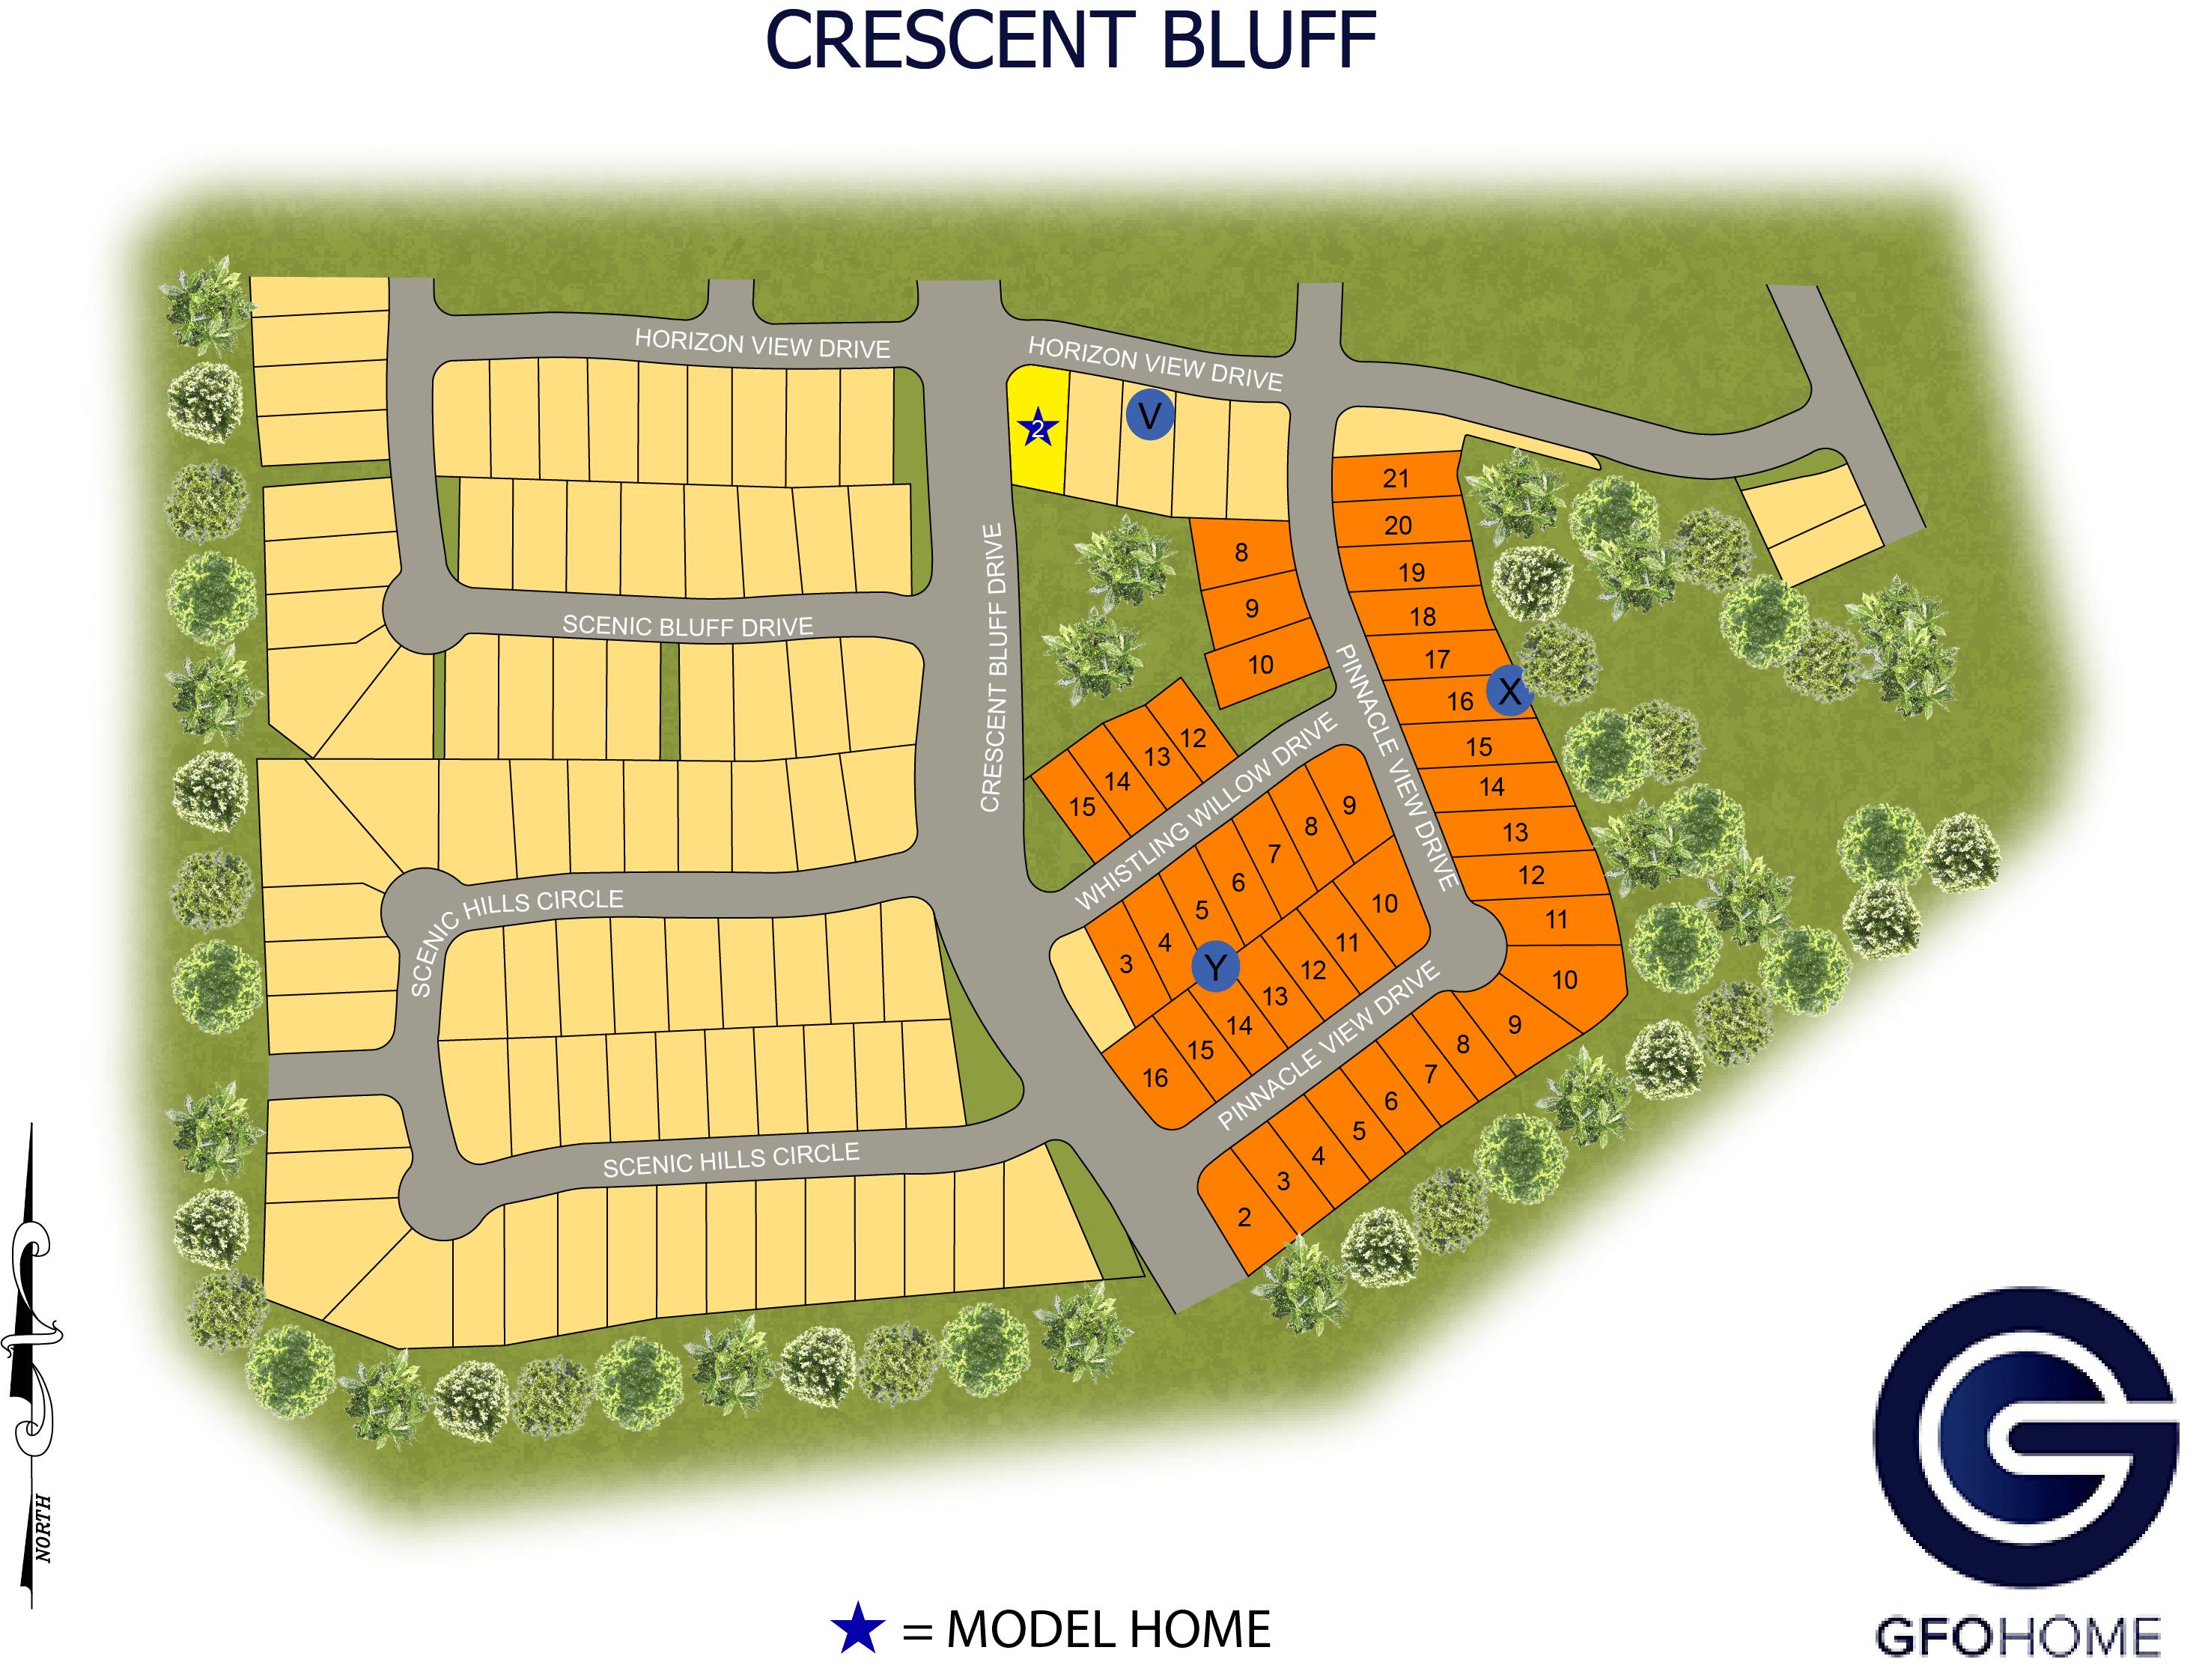 Crescent Bluff